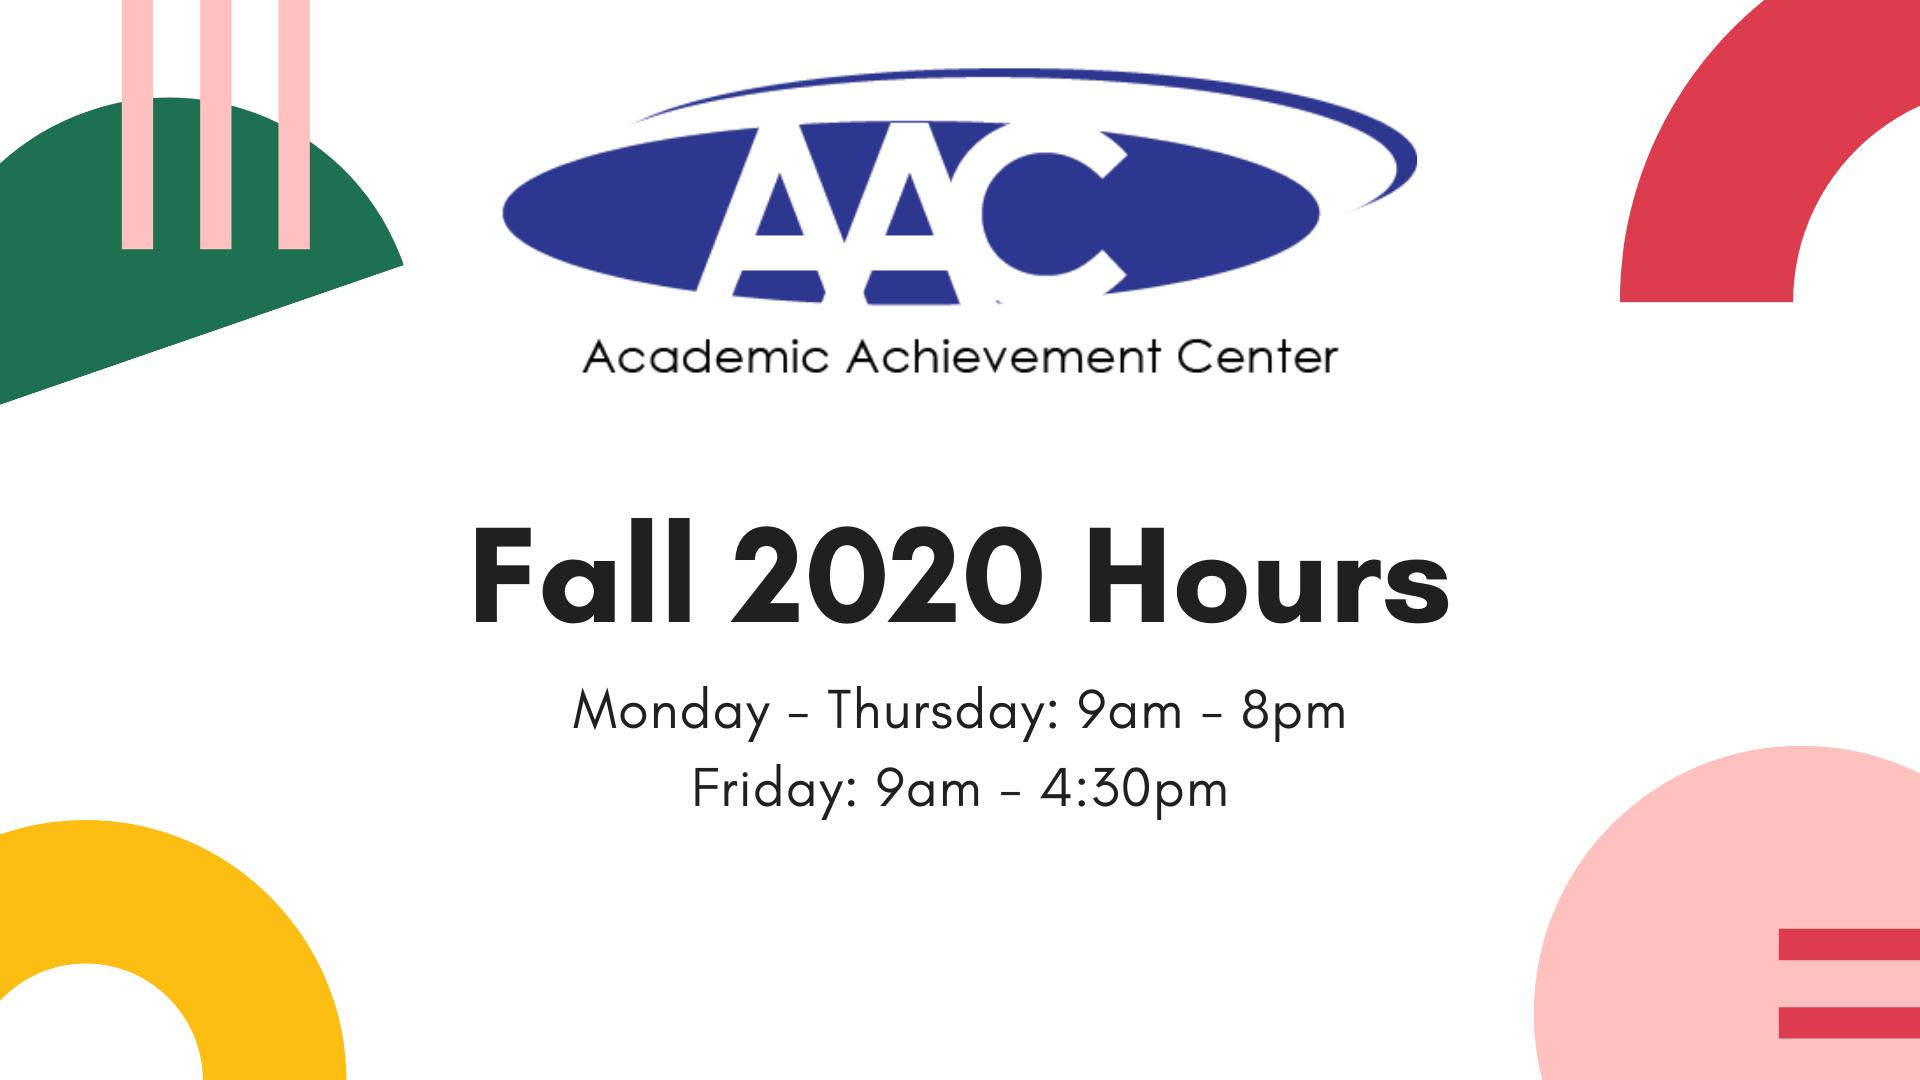 AAC Hours